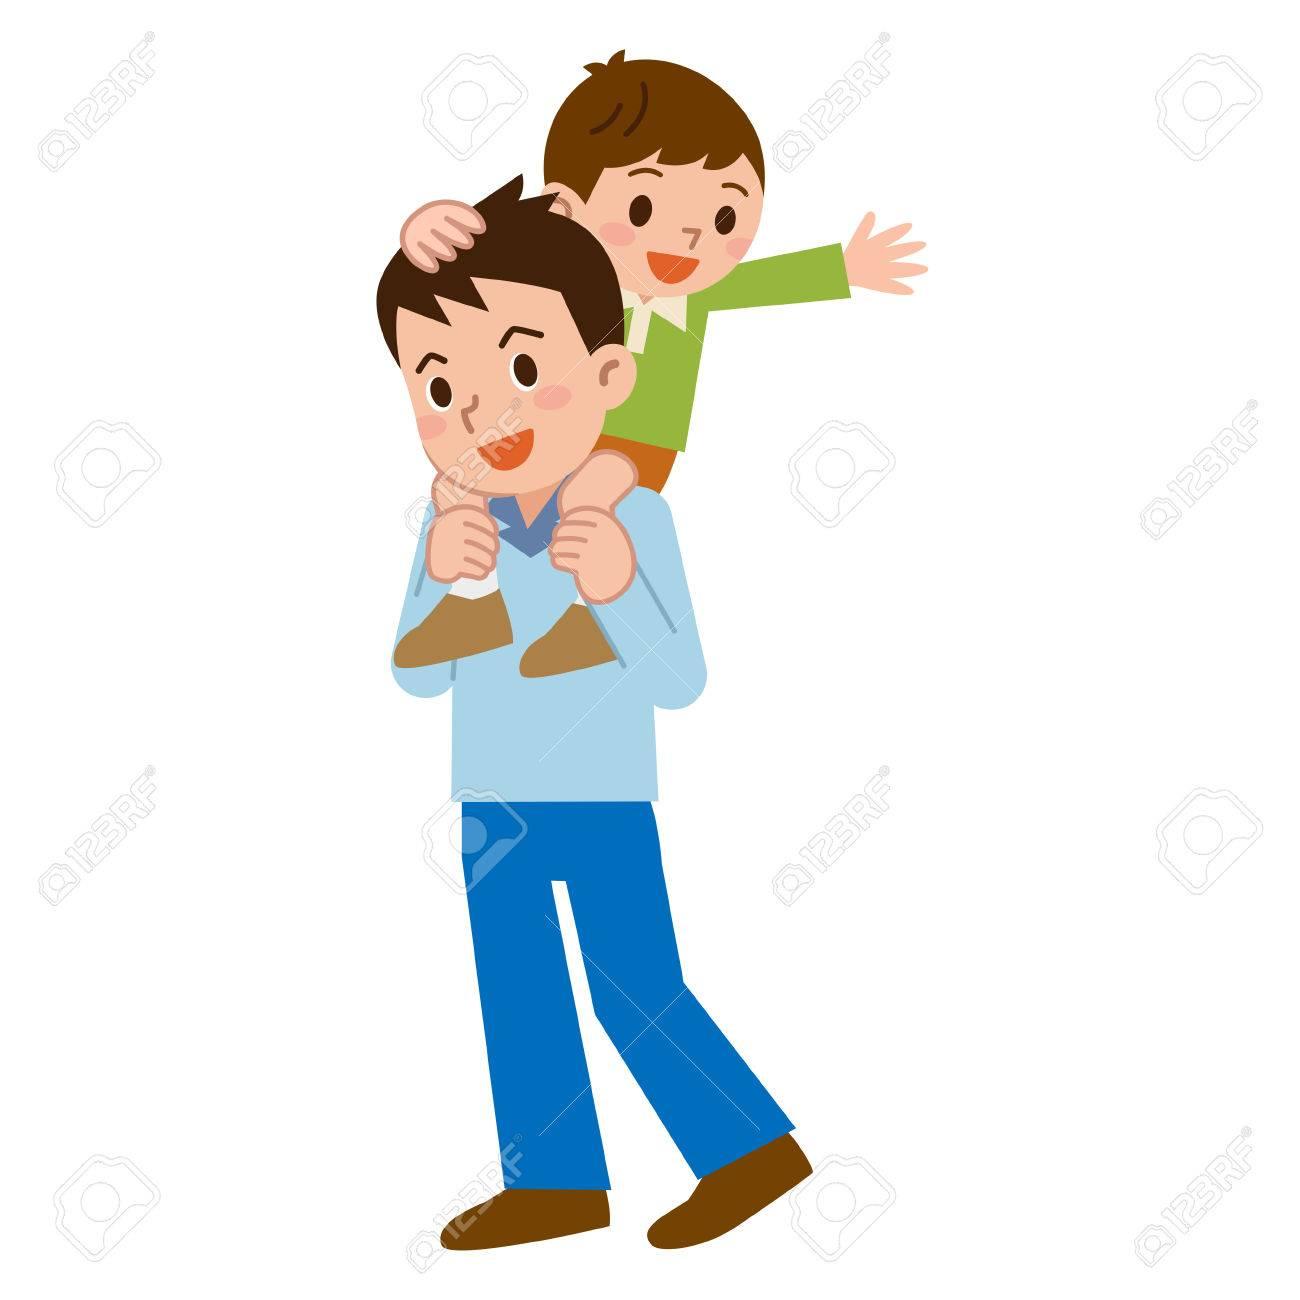 Parent and child to a piggyback - 56653657